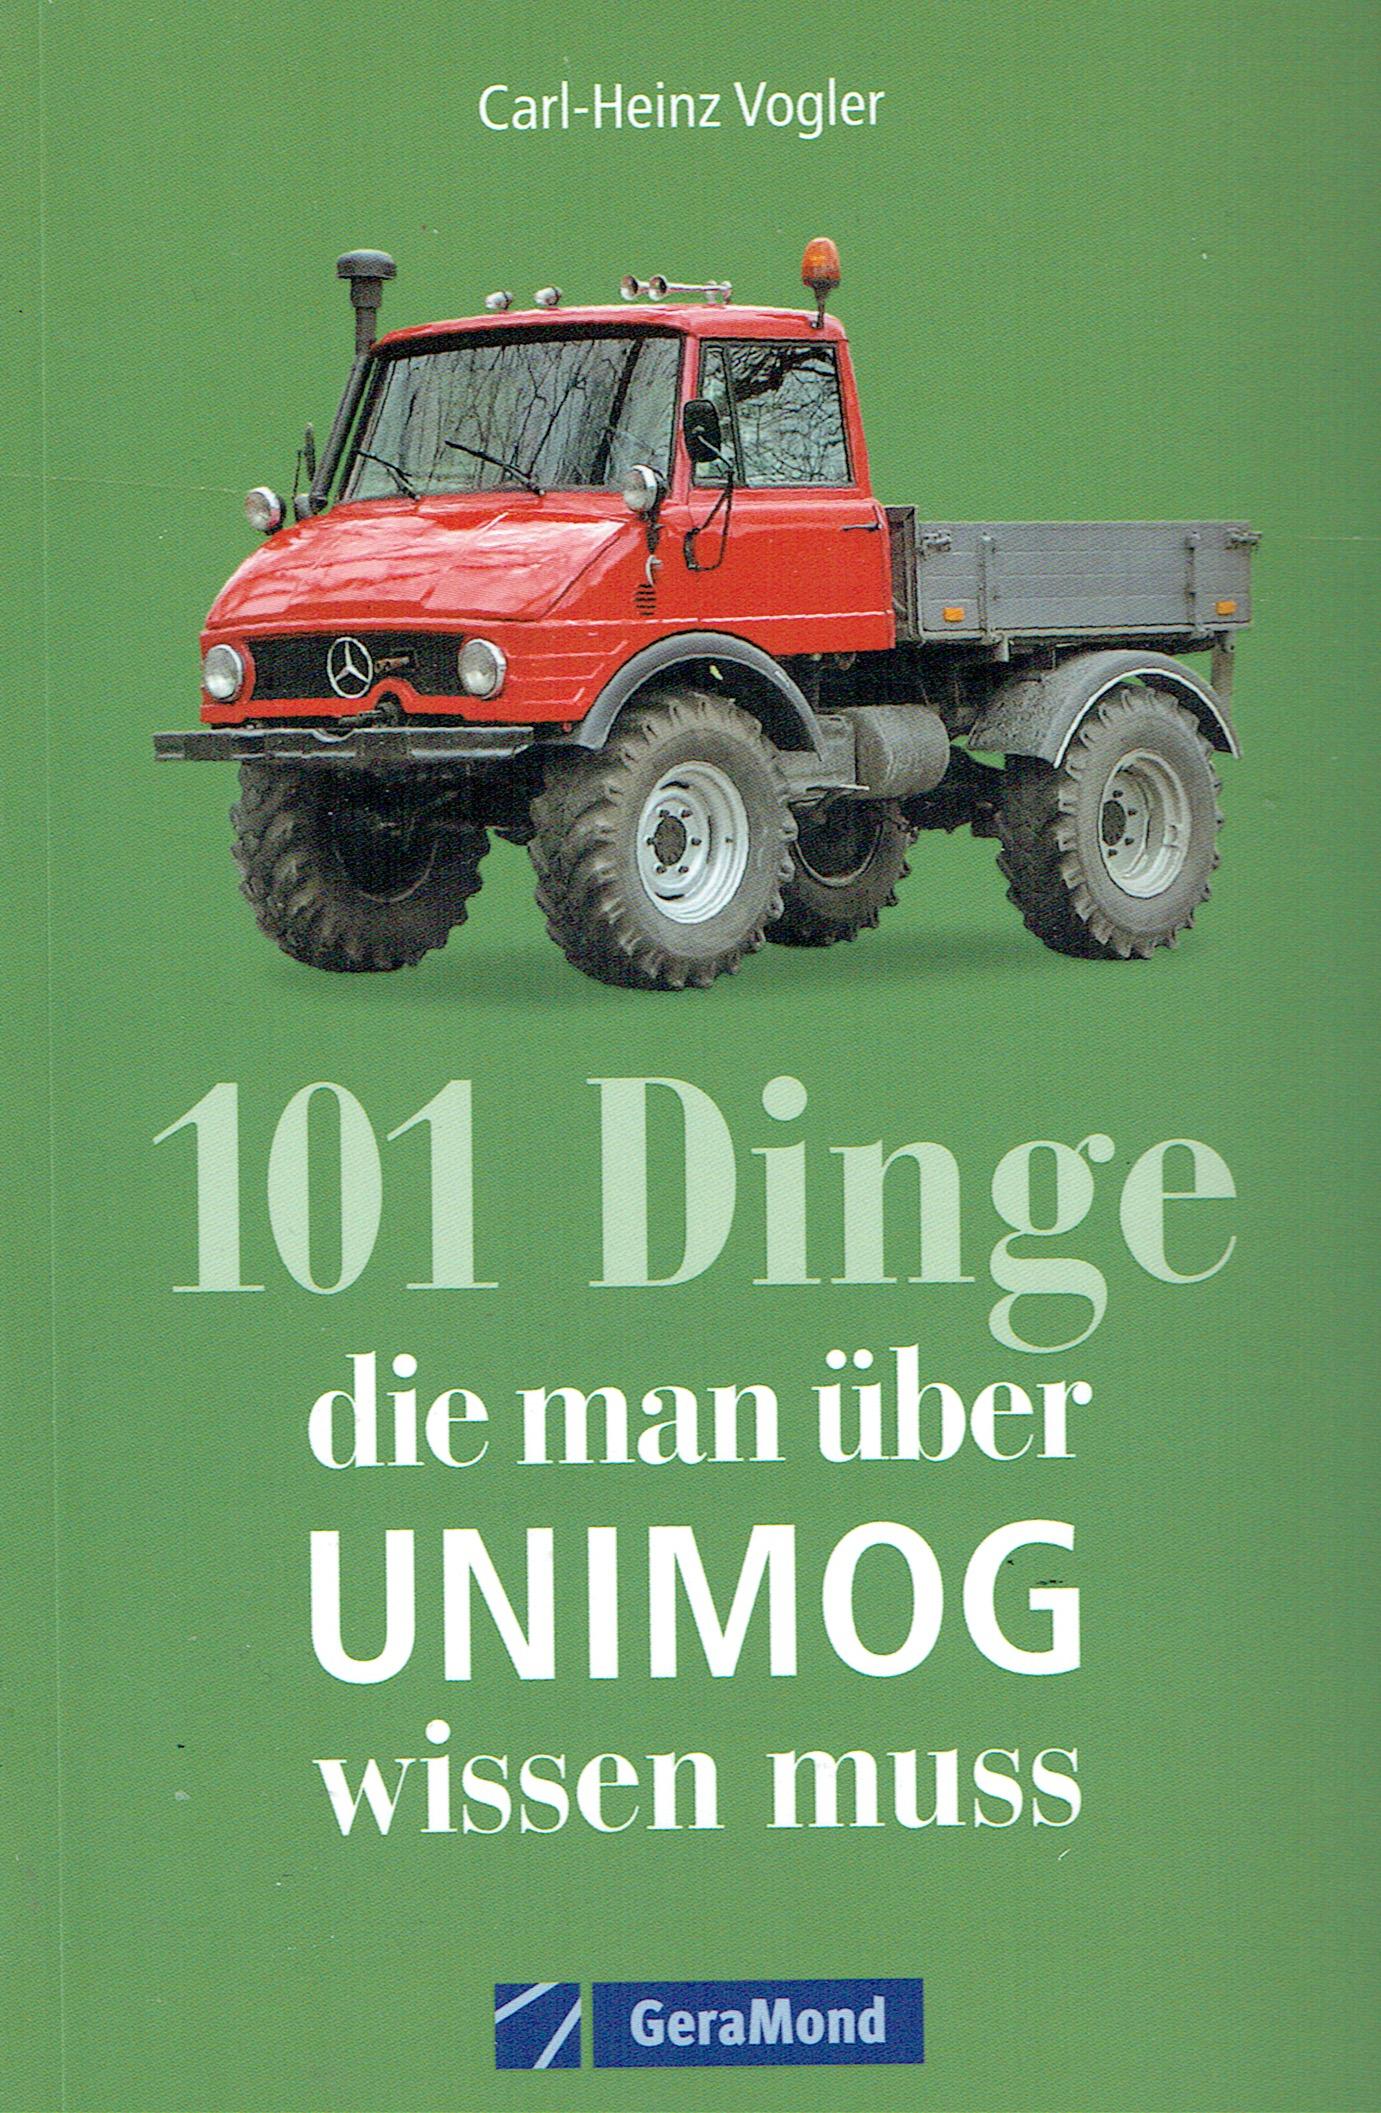 Bub5 Unimog 101 Dinge Vogler